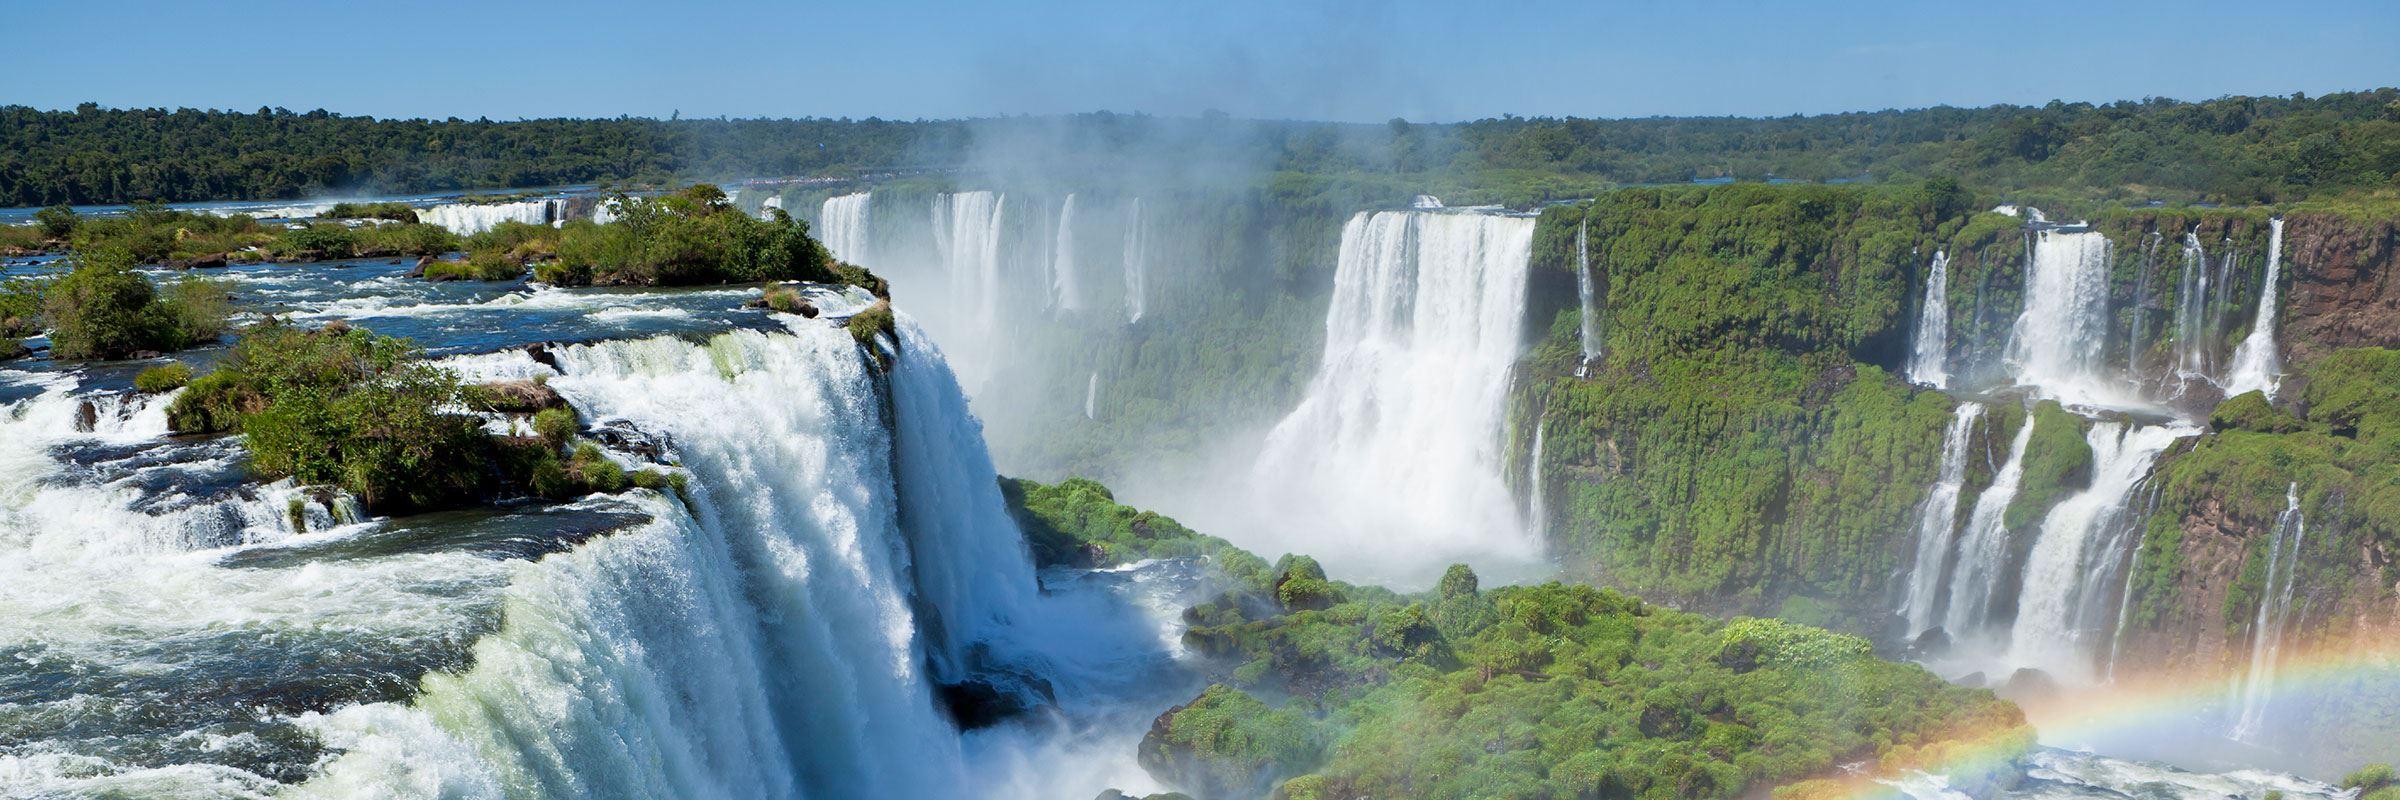 Visit Iguazú Falls, Argentina